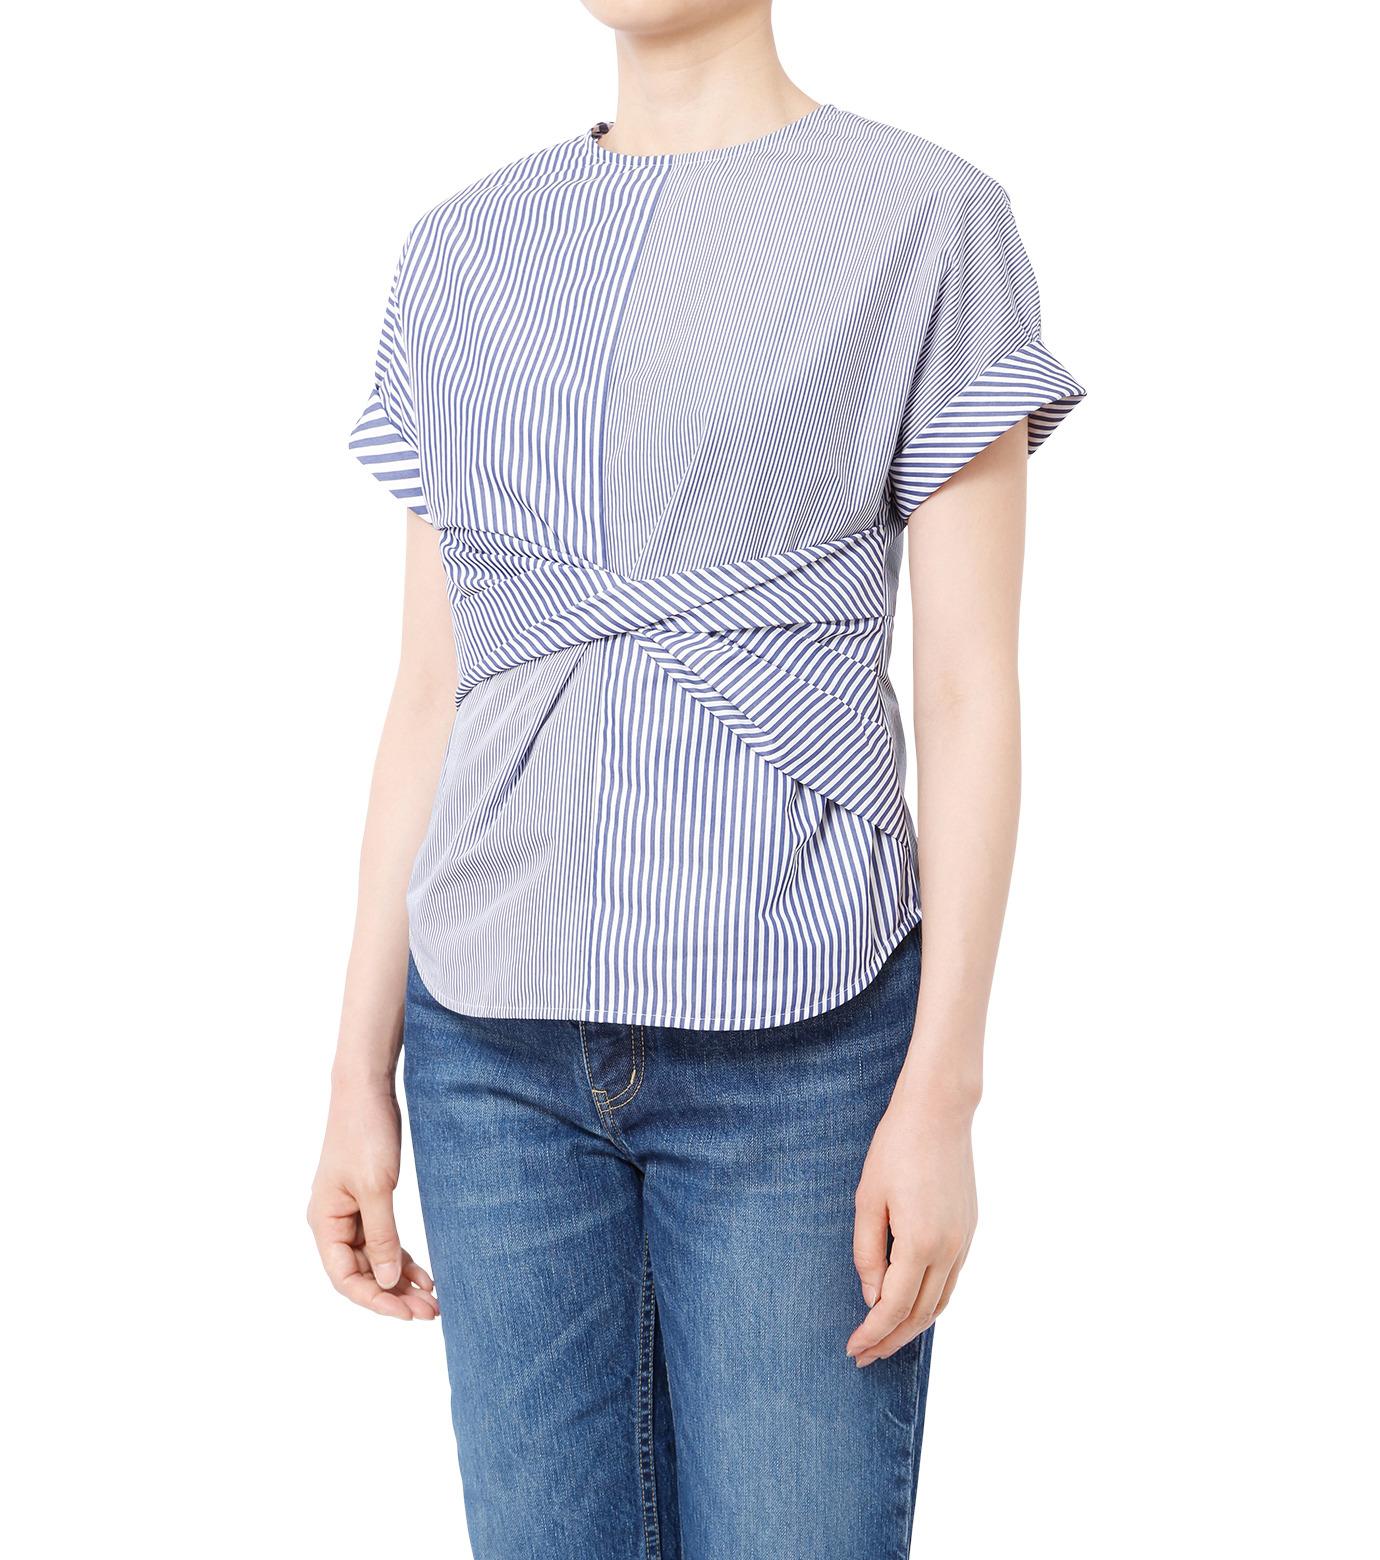 LE CIEL BLEU(ルシェルブルー)のストライプツイストトップス-MULTI COLOUR(シャツ/shirt)-18A63313 拡大詳細画像1